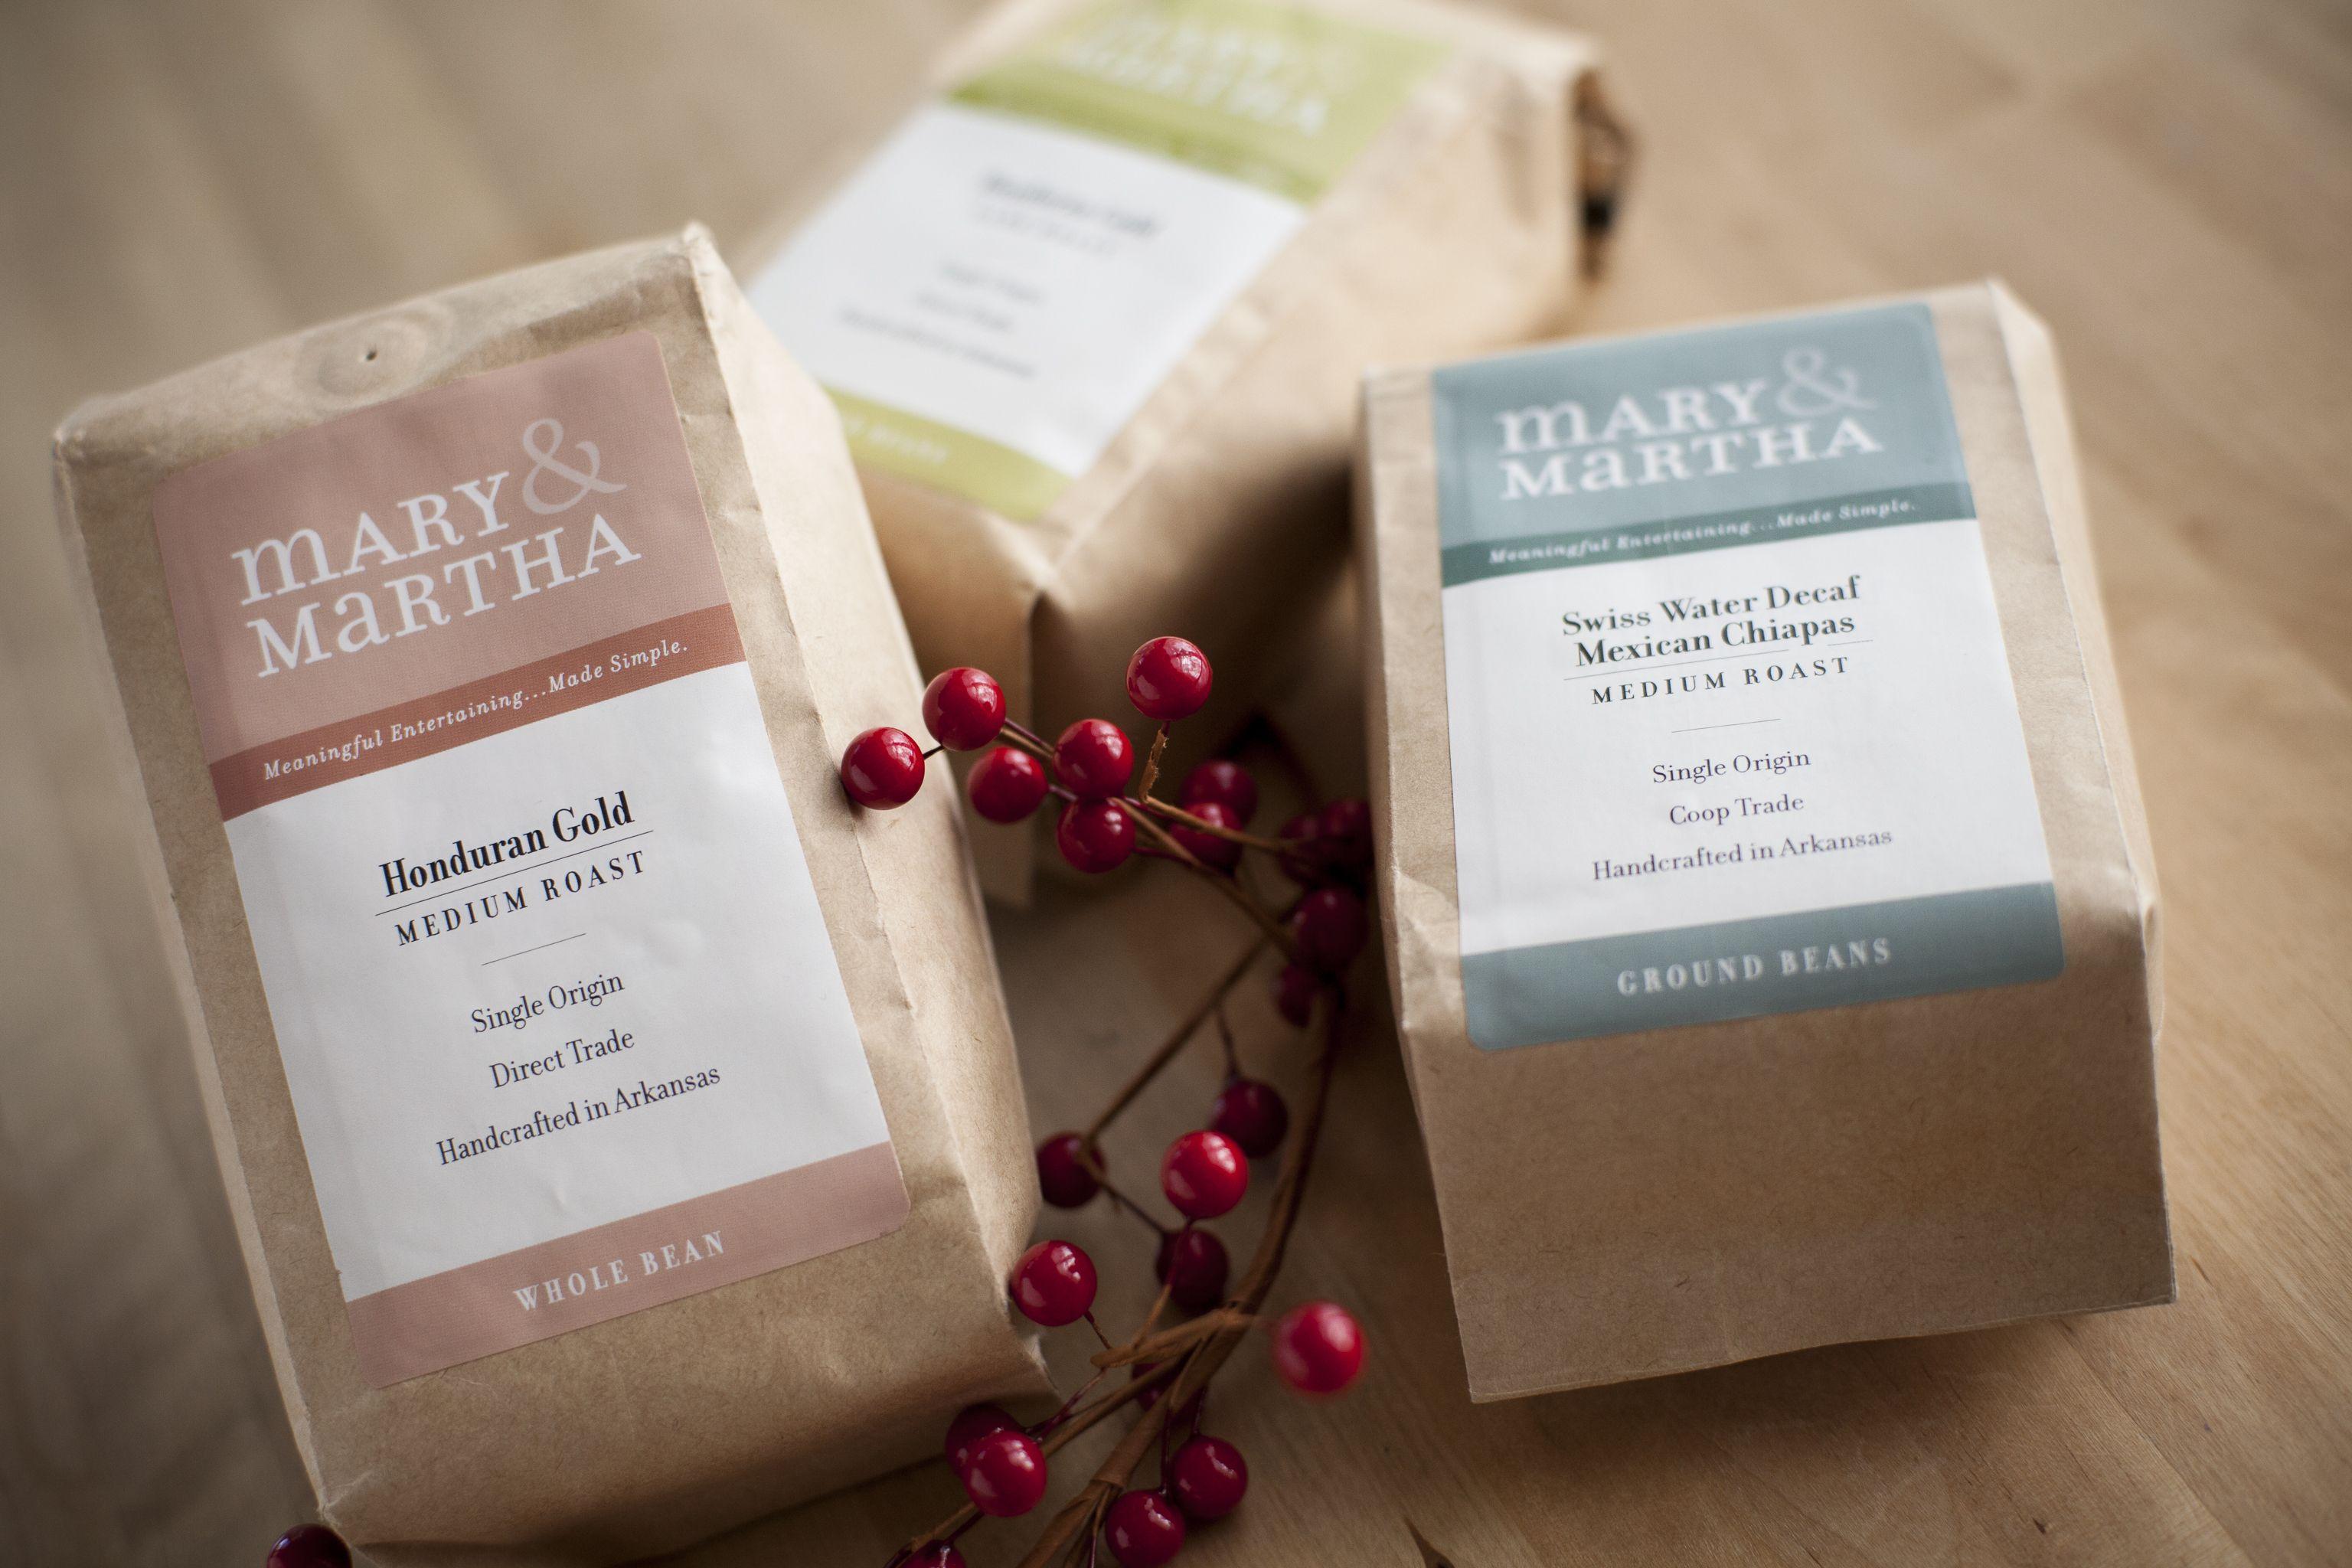 Mary & Martha's Blend Coffees. More at www.mymaryandmartha.com/KARENHUSECLIFTON